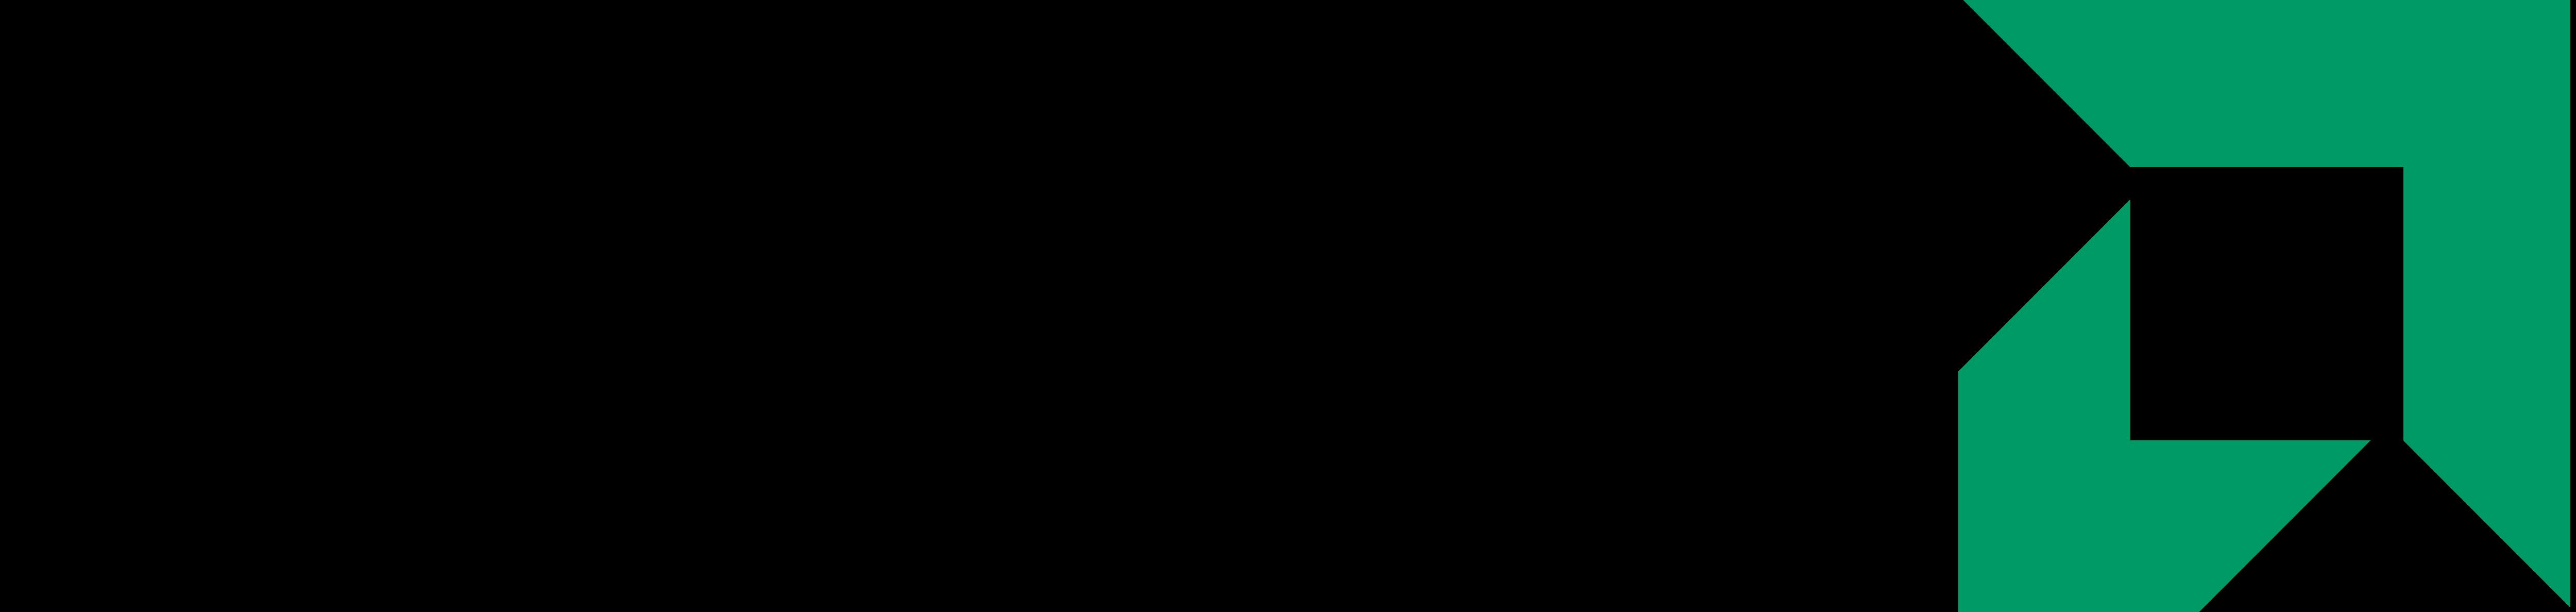 amd logos download intel xeon logo vector intel logo vectorial